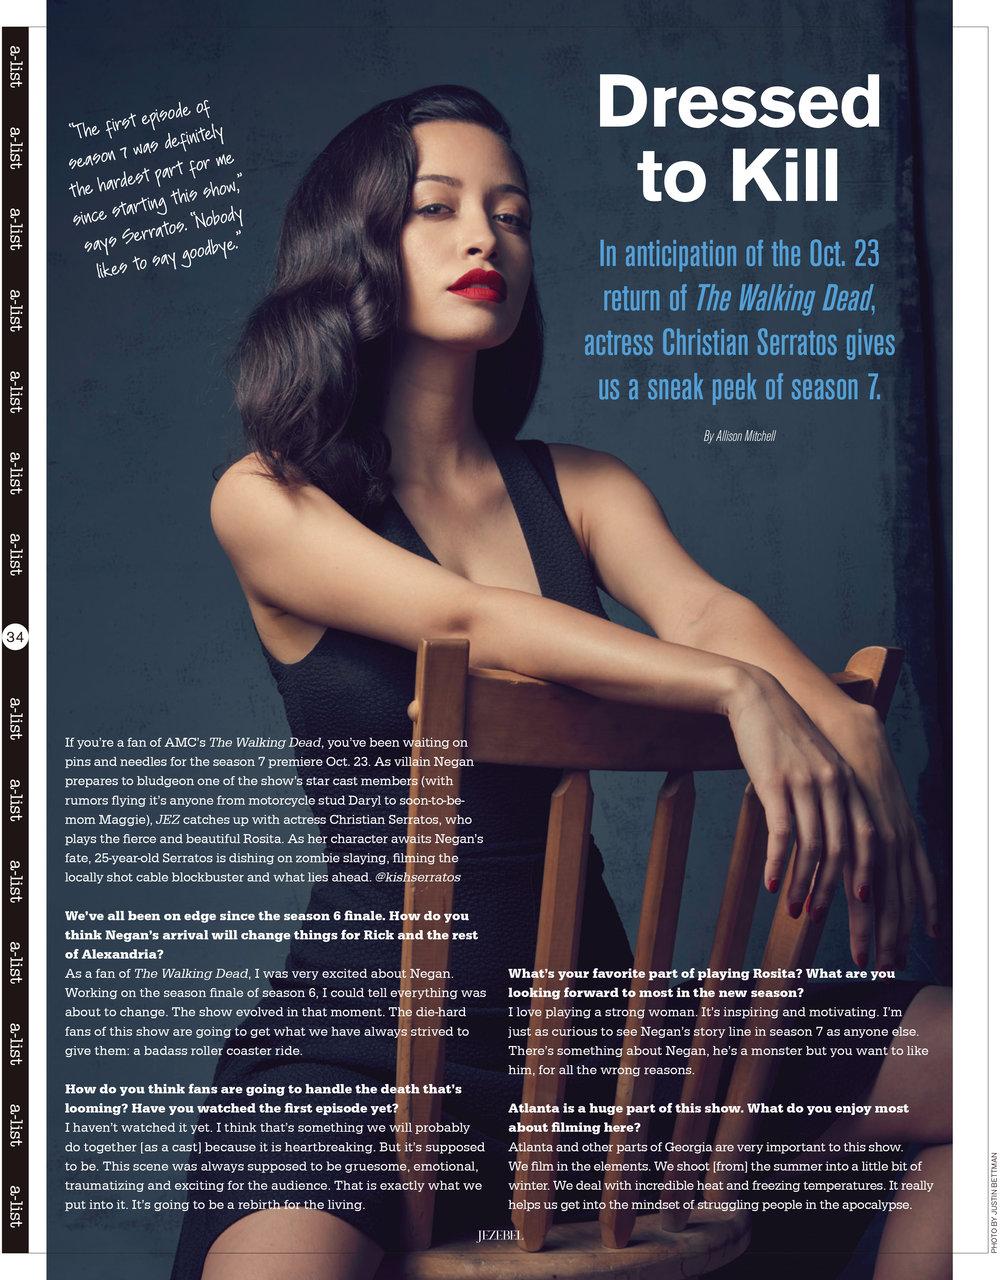 Christian Serratos - JEZEBEL Magazine - October 2016 copy.jpg